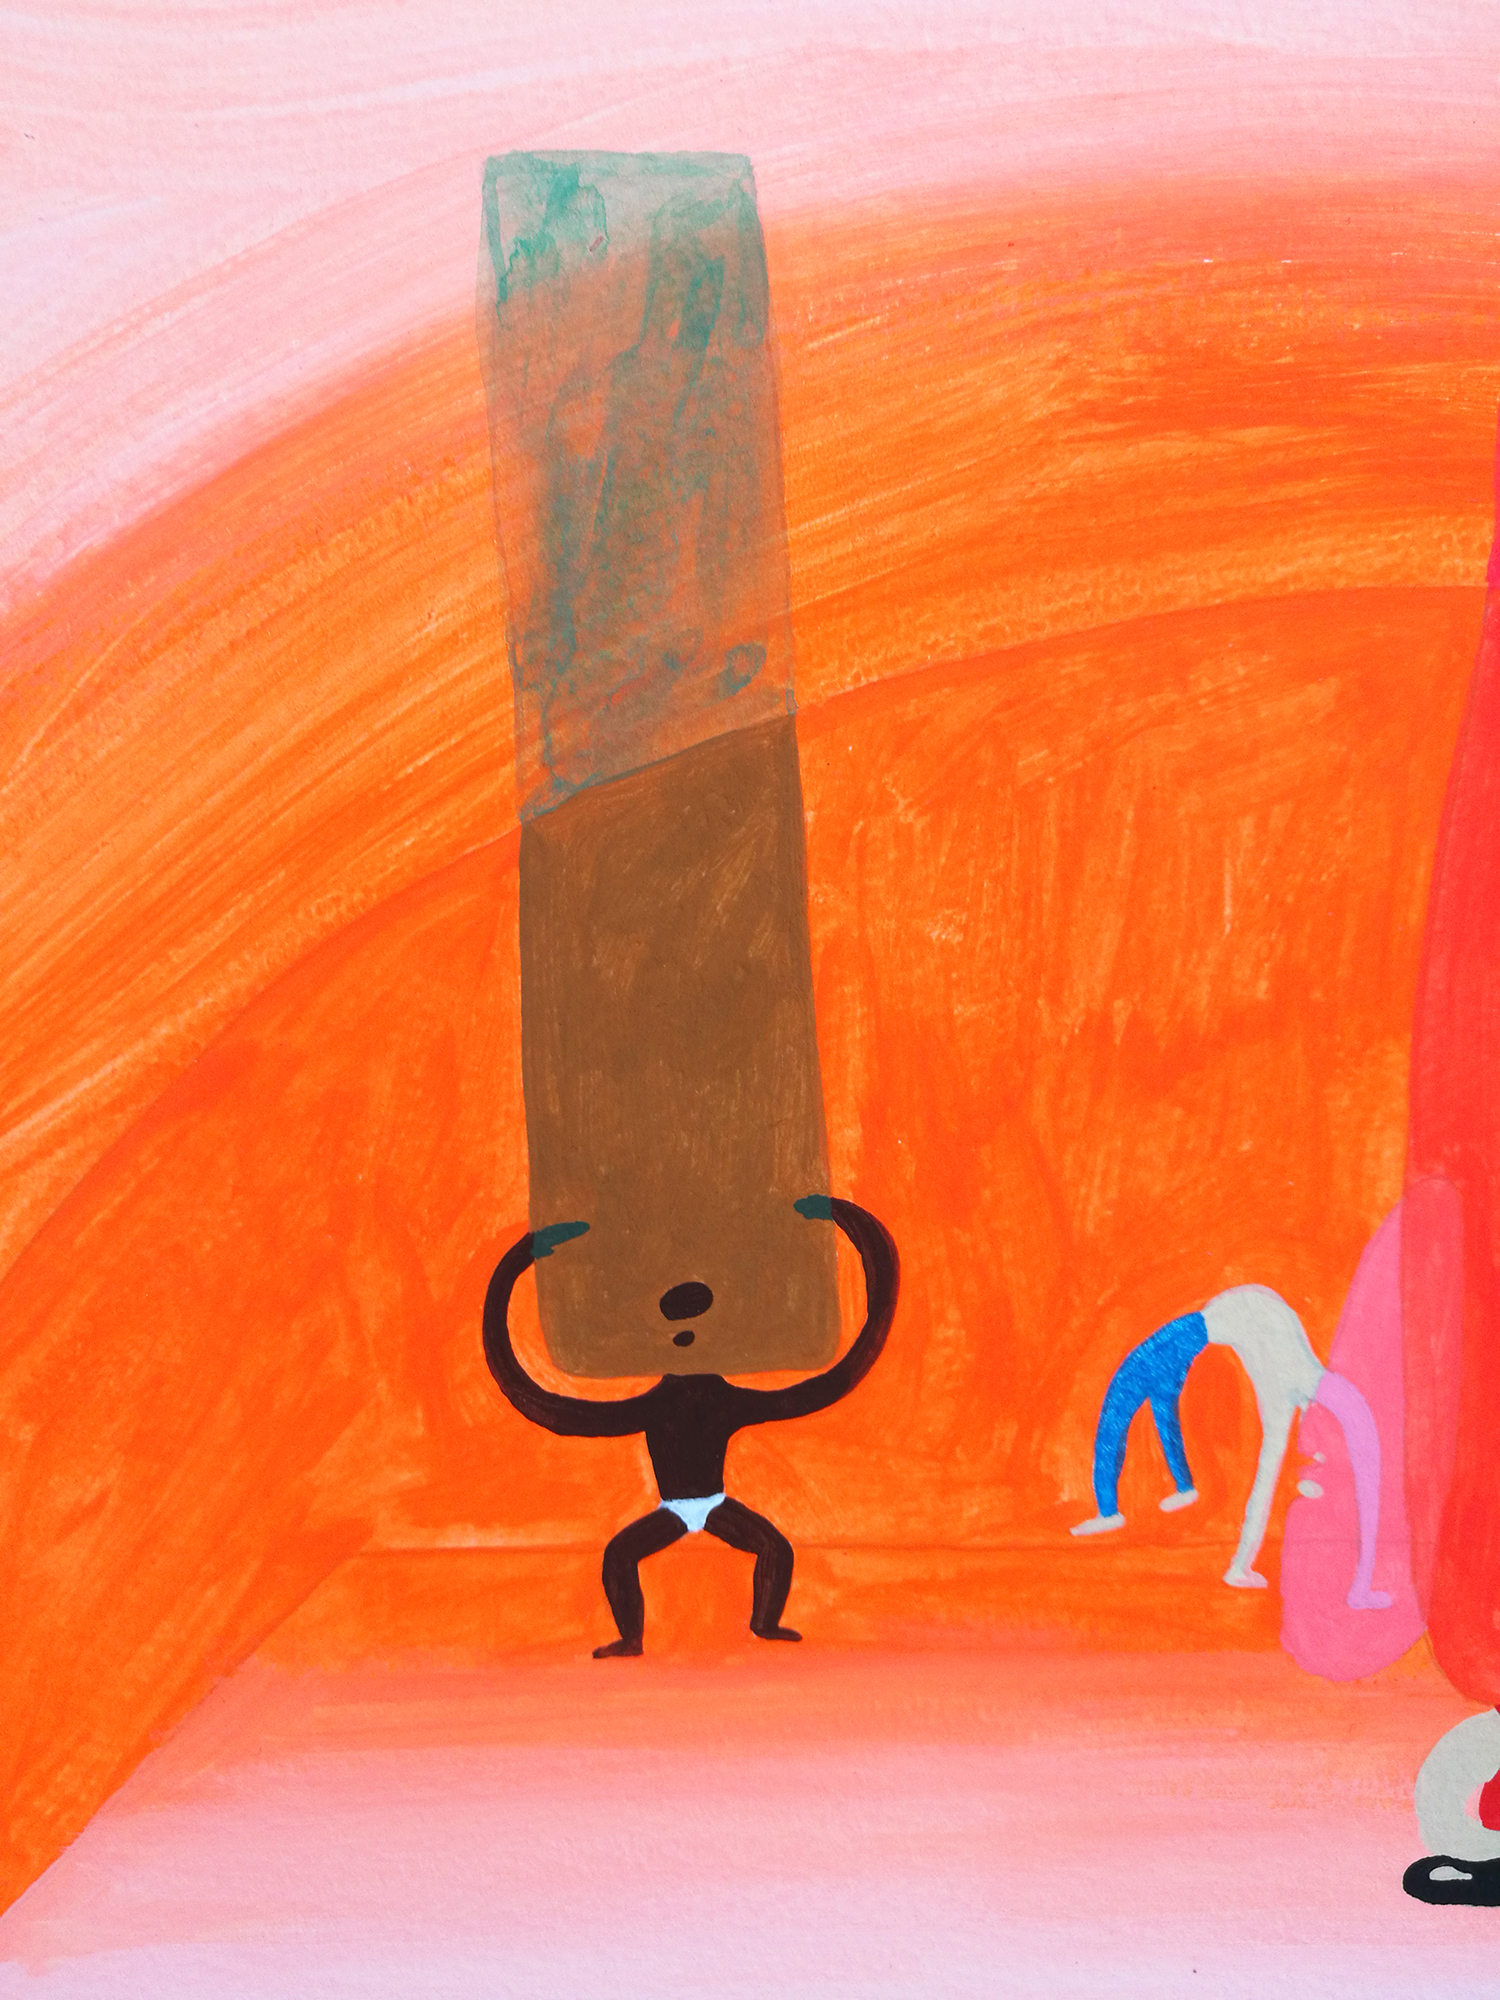 Peter McDonald_Hot Yoga_Acrylic gouache on paper_30x21cm_2013_detailshot.jpg